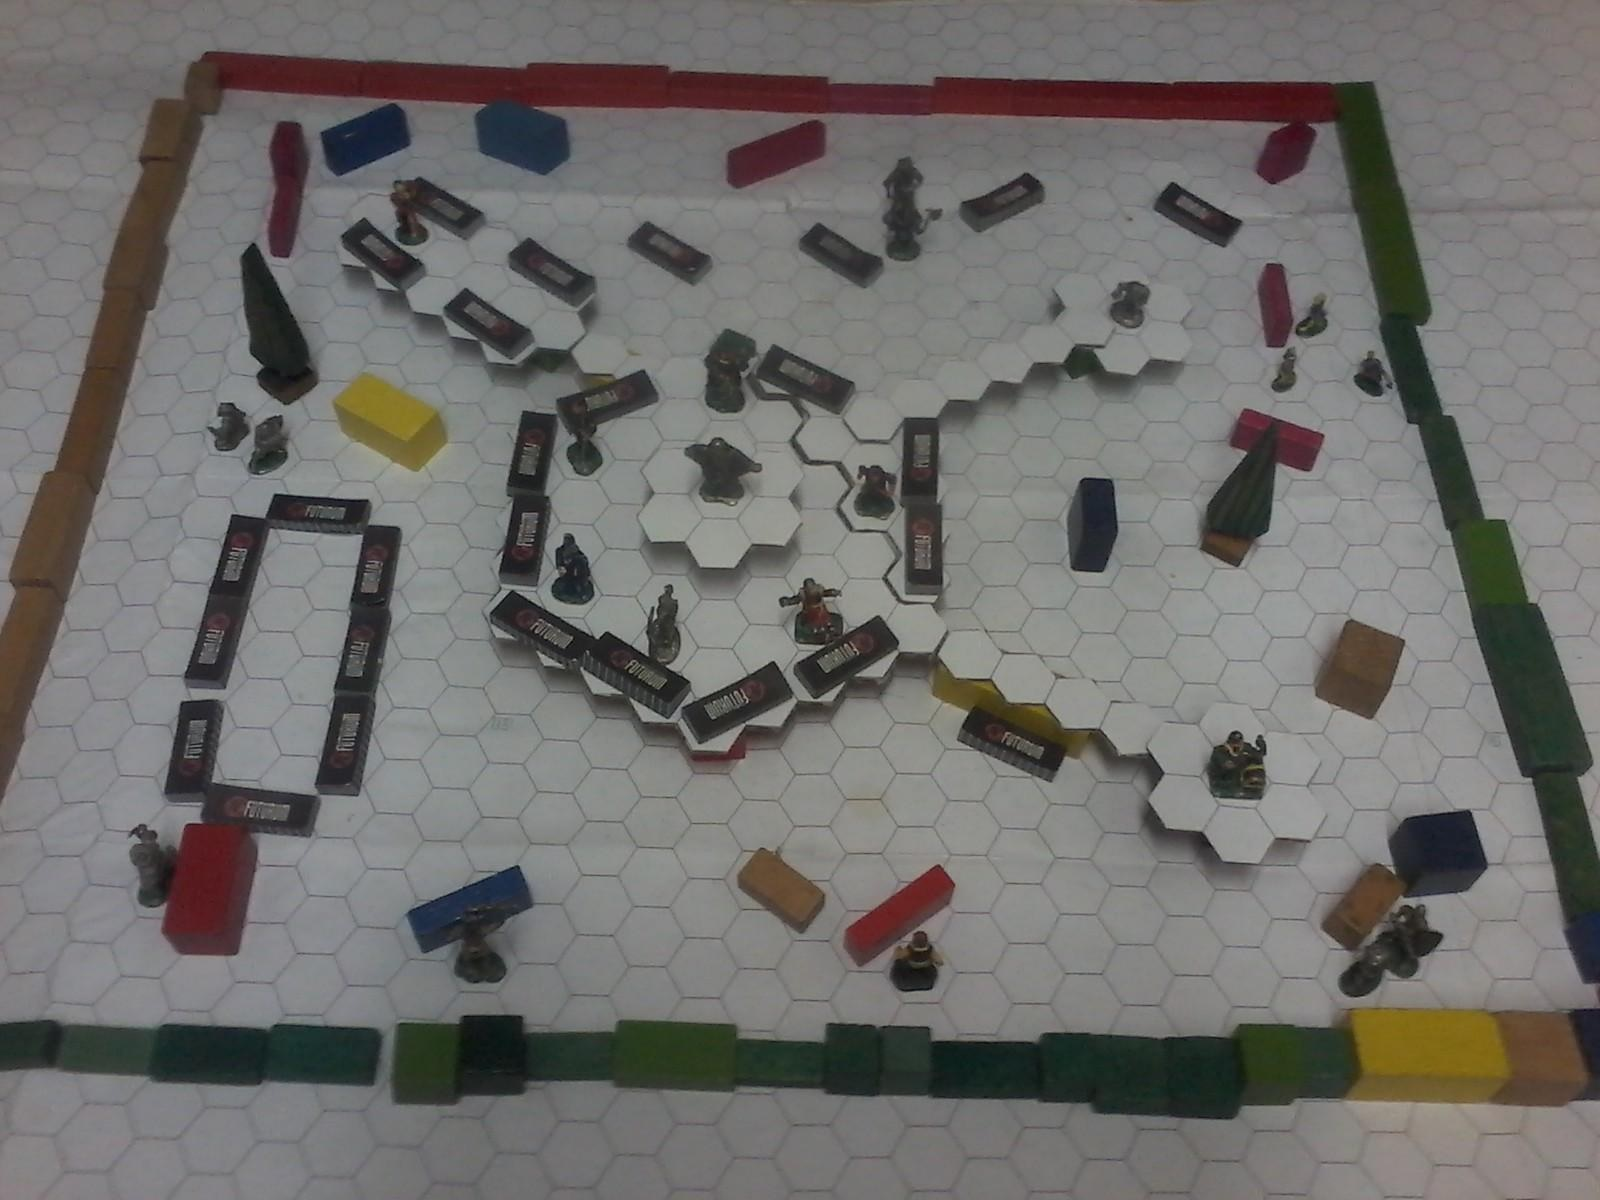 Test combat mechanics of the game on battleground